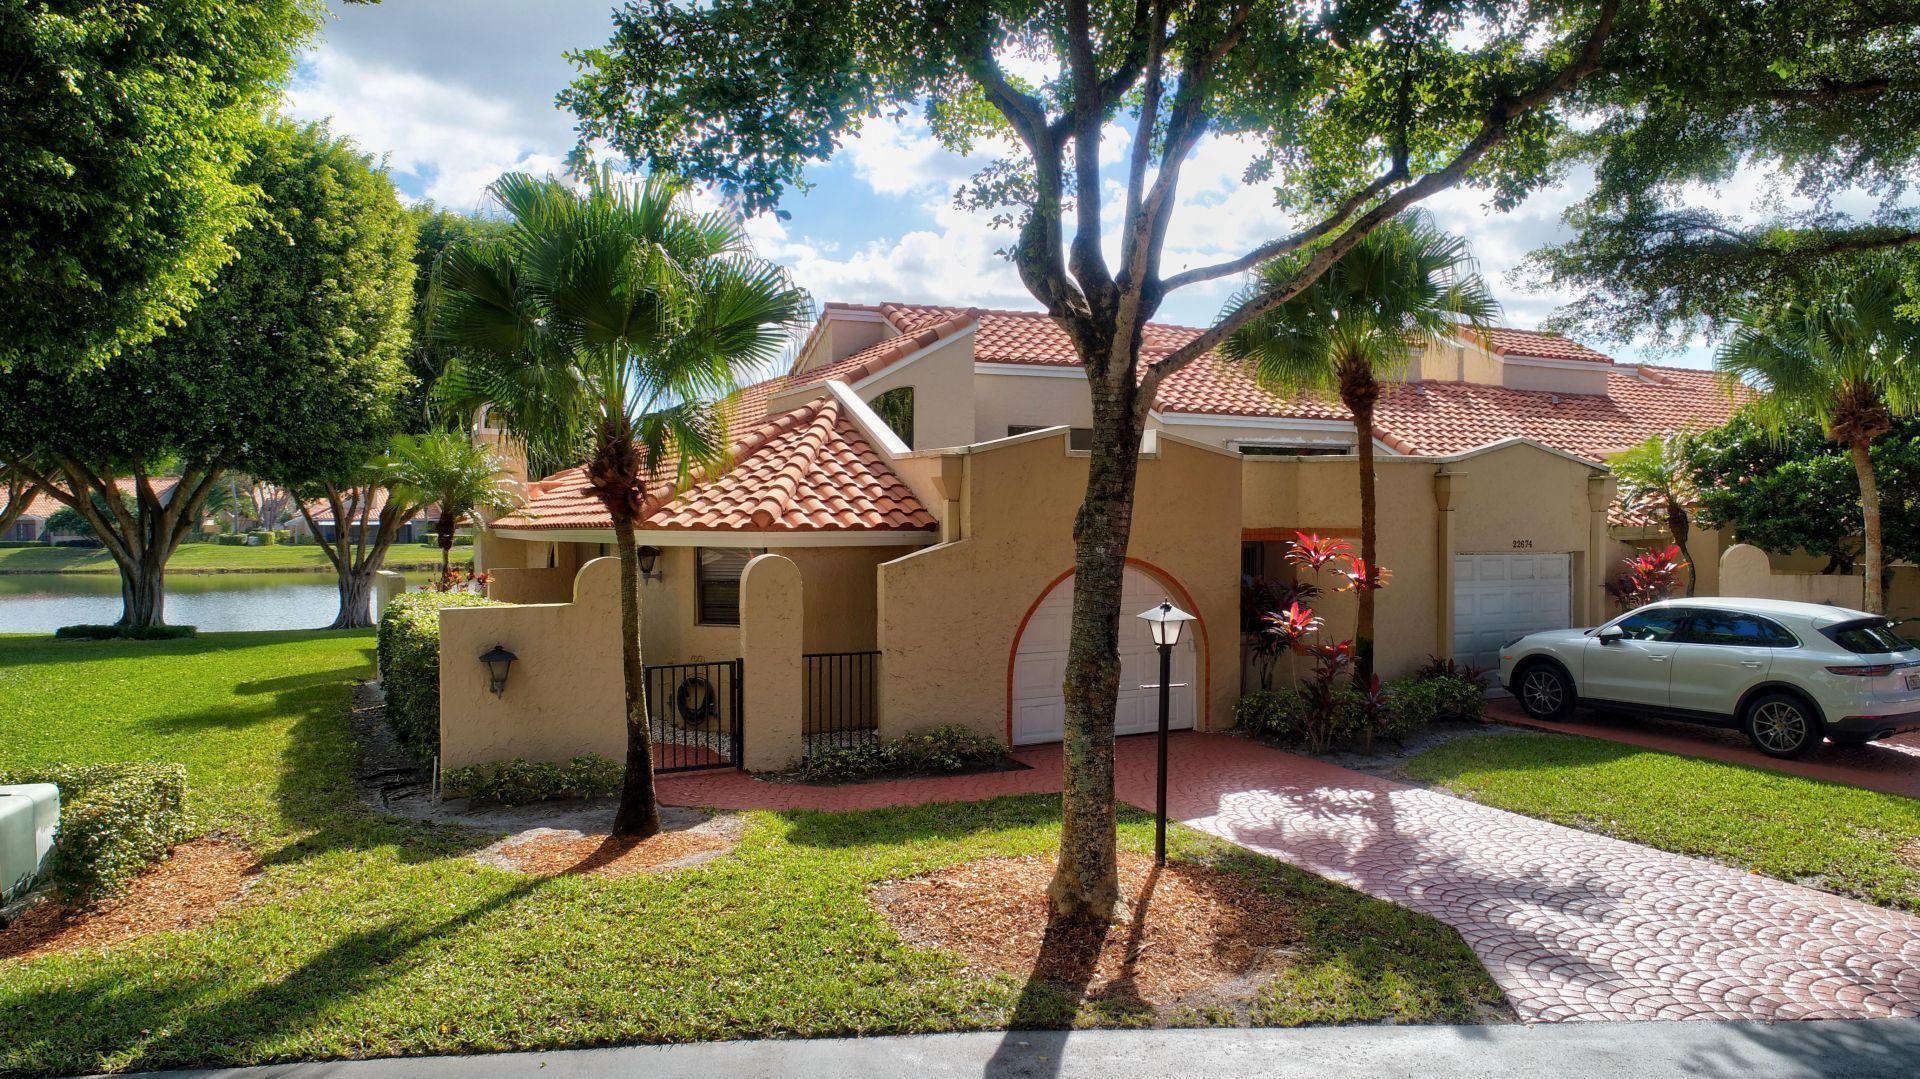 22672 Meridiana Drive, Boca Raton, FL 33433 - #: RX-10686208